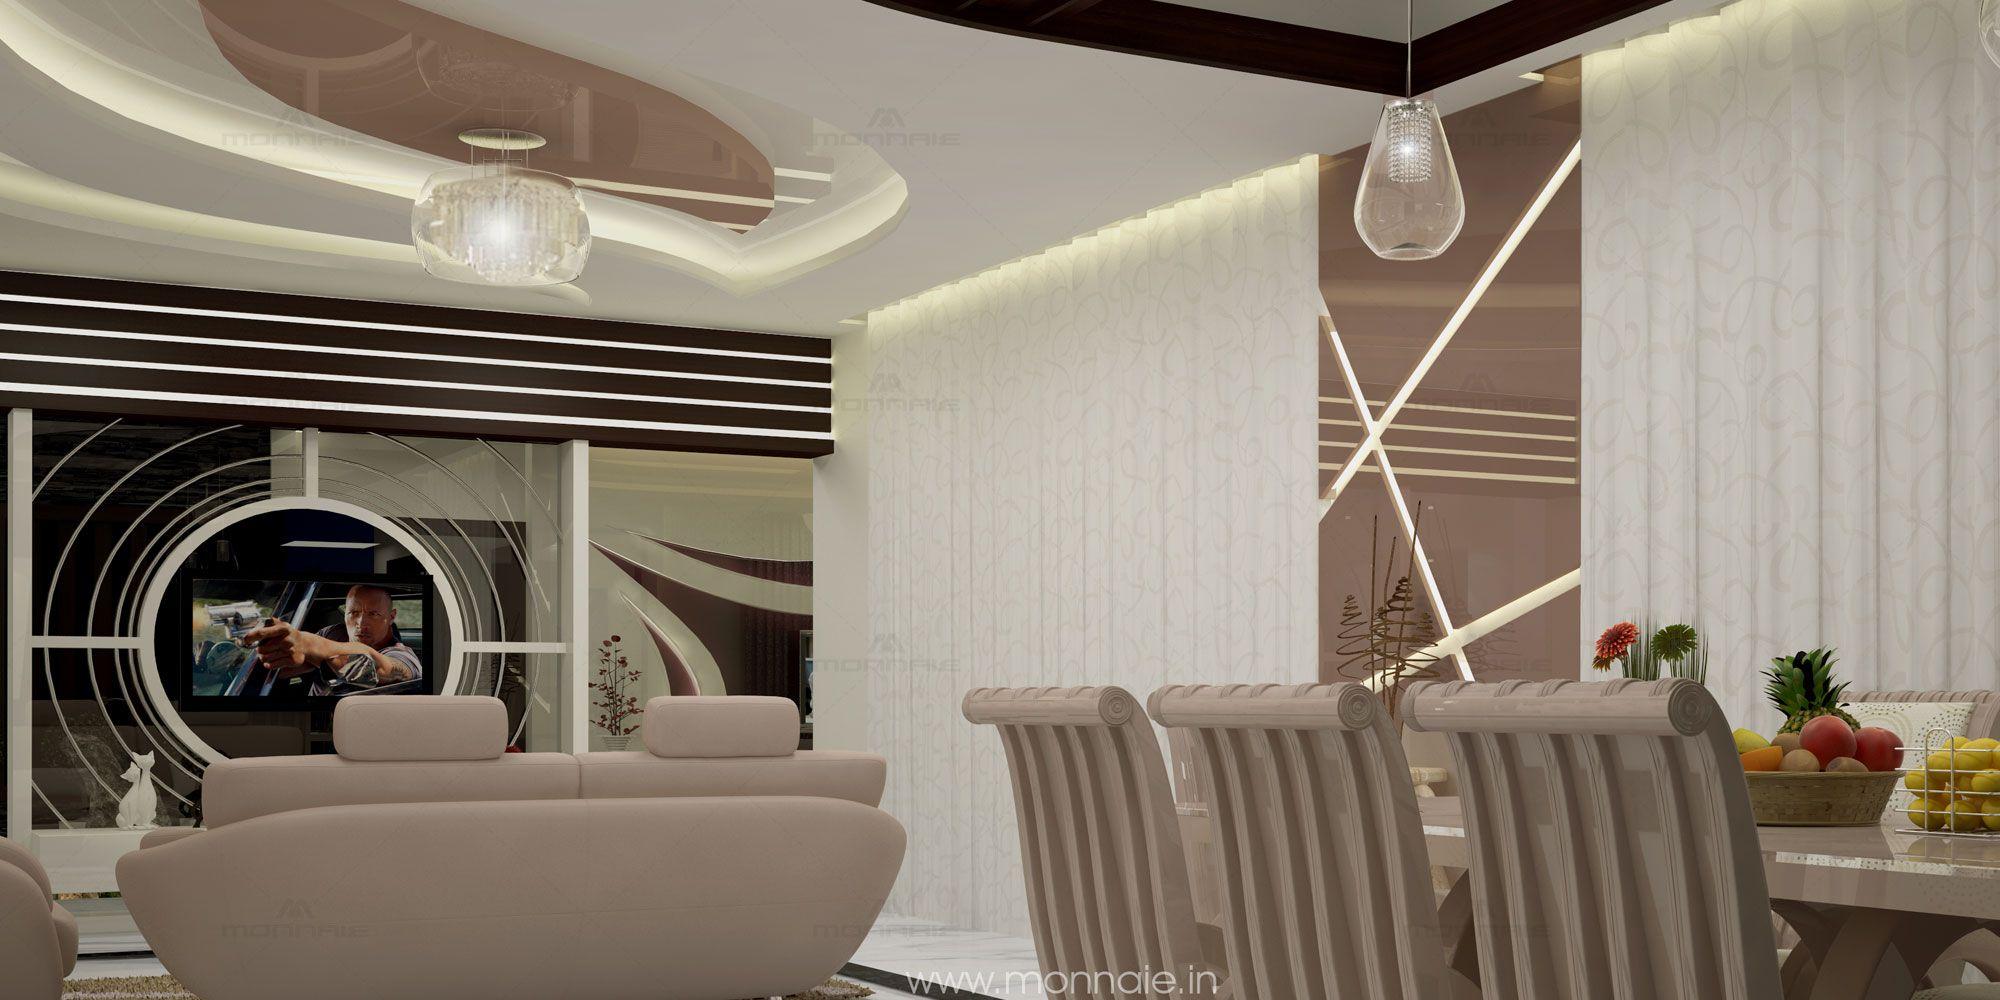 D'life home interiors - kottayam kottayam kerala famous interior decorators in thrissur  interior decorators